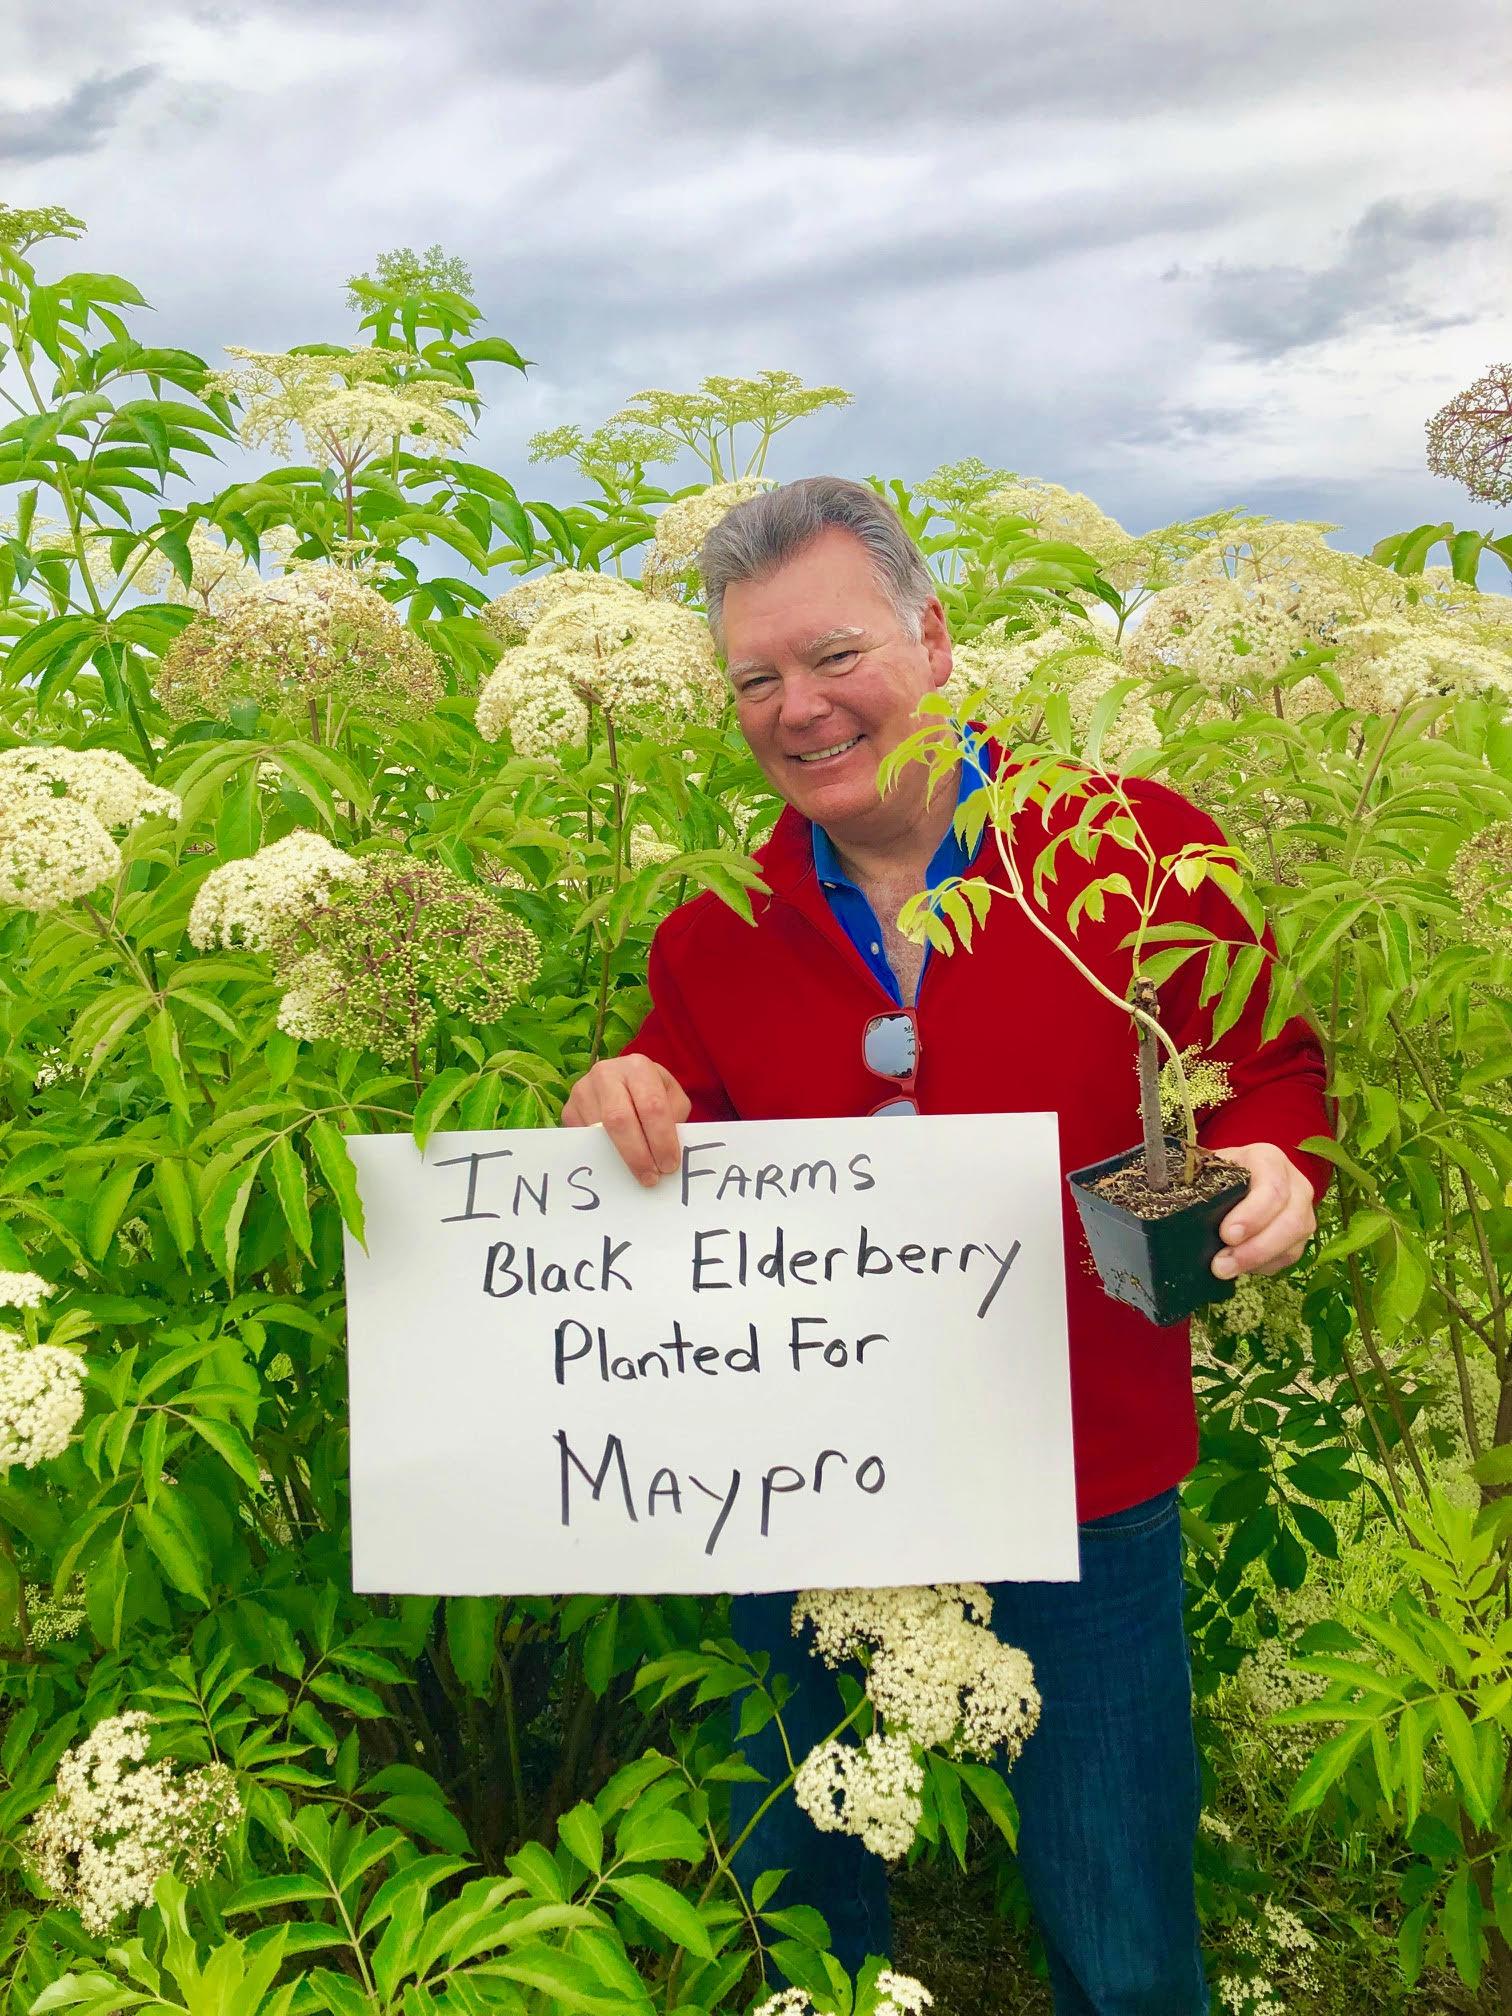 Plant-Elderberry-Maypro.jpg